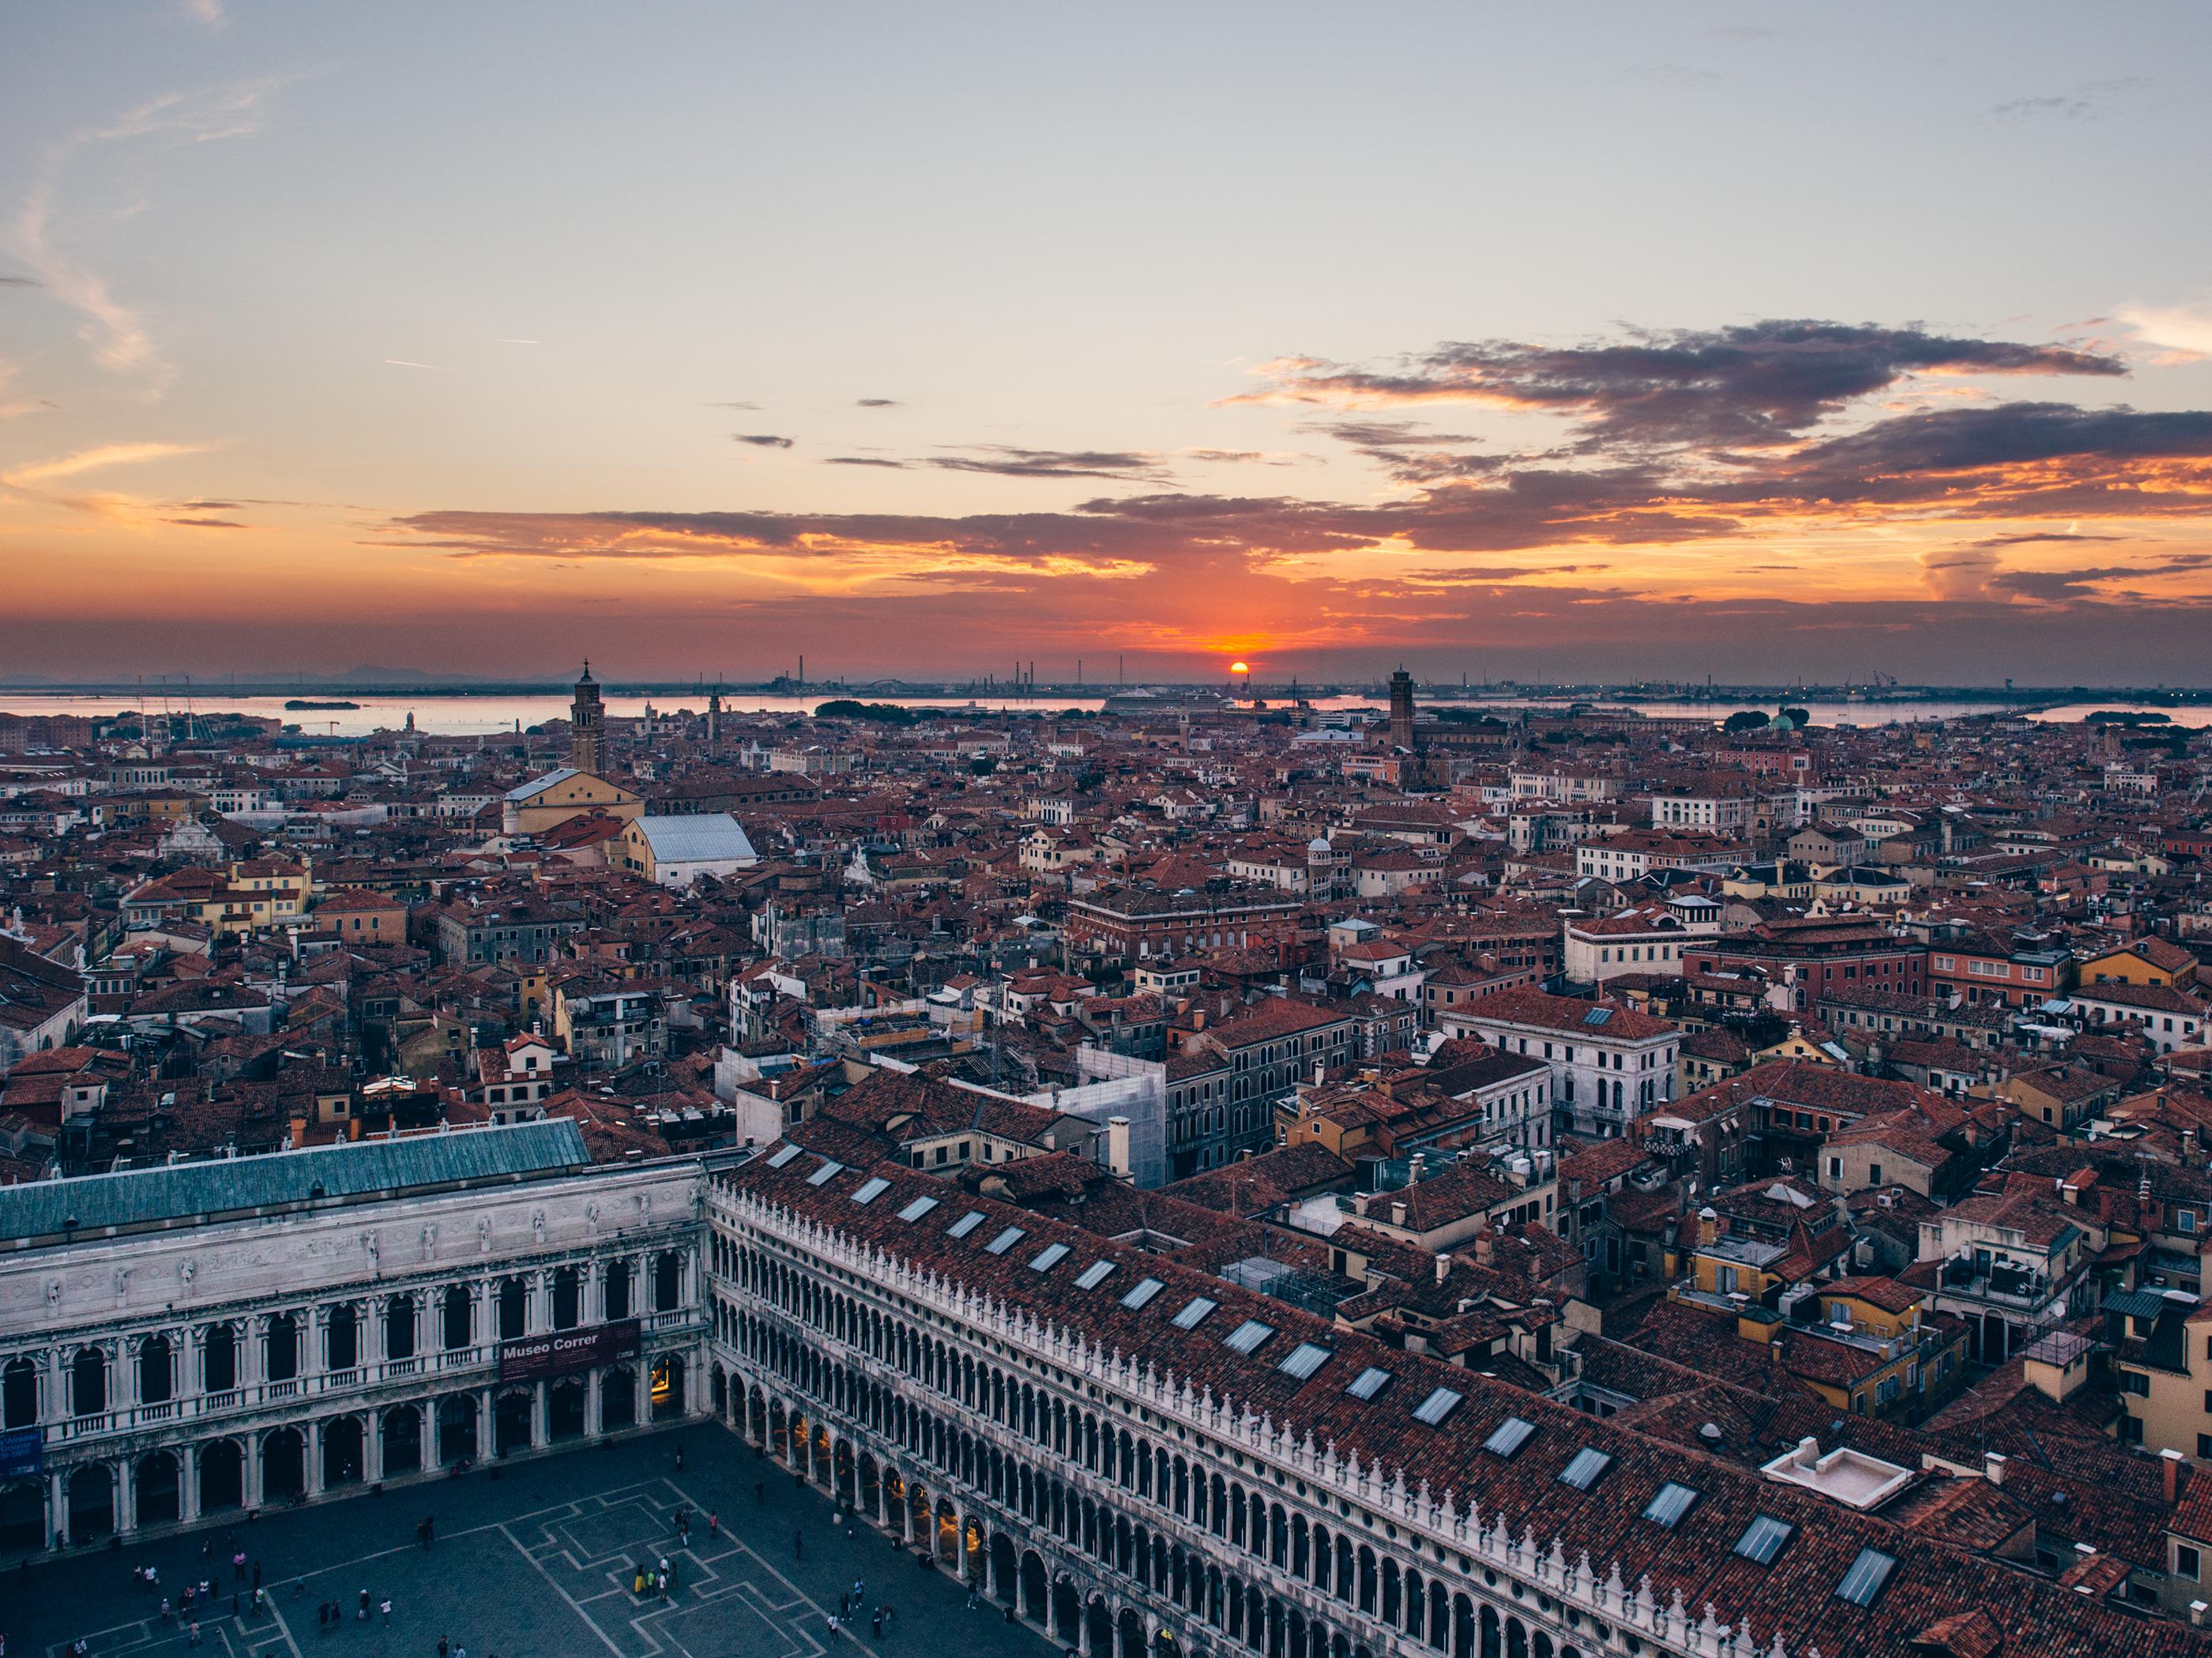 Venice Piazzo San Marco